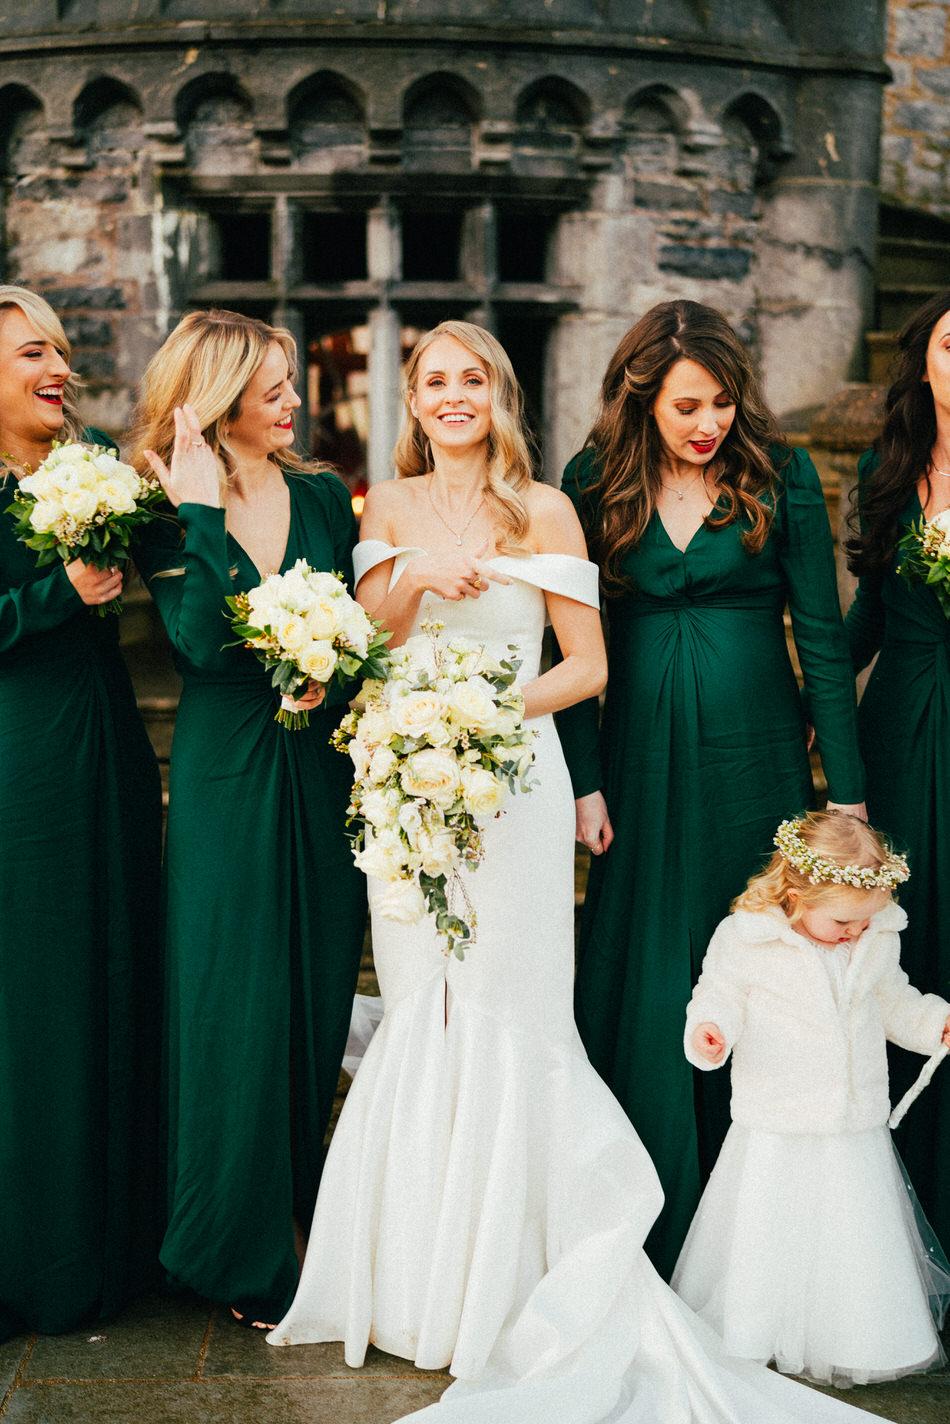 Castle-wedding-ireland-photos- 0209 150